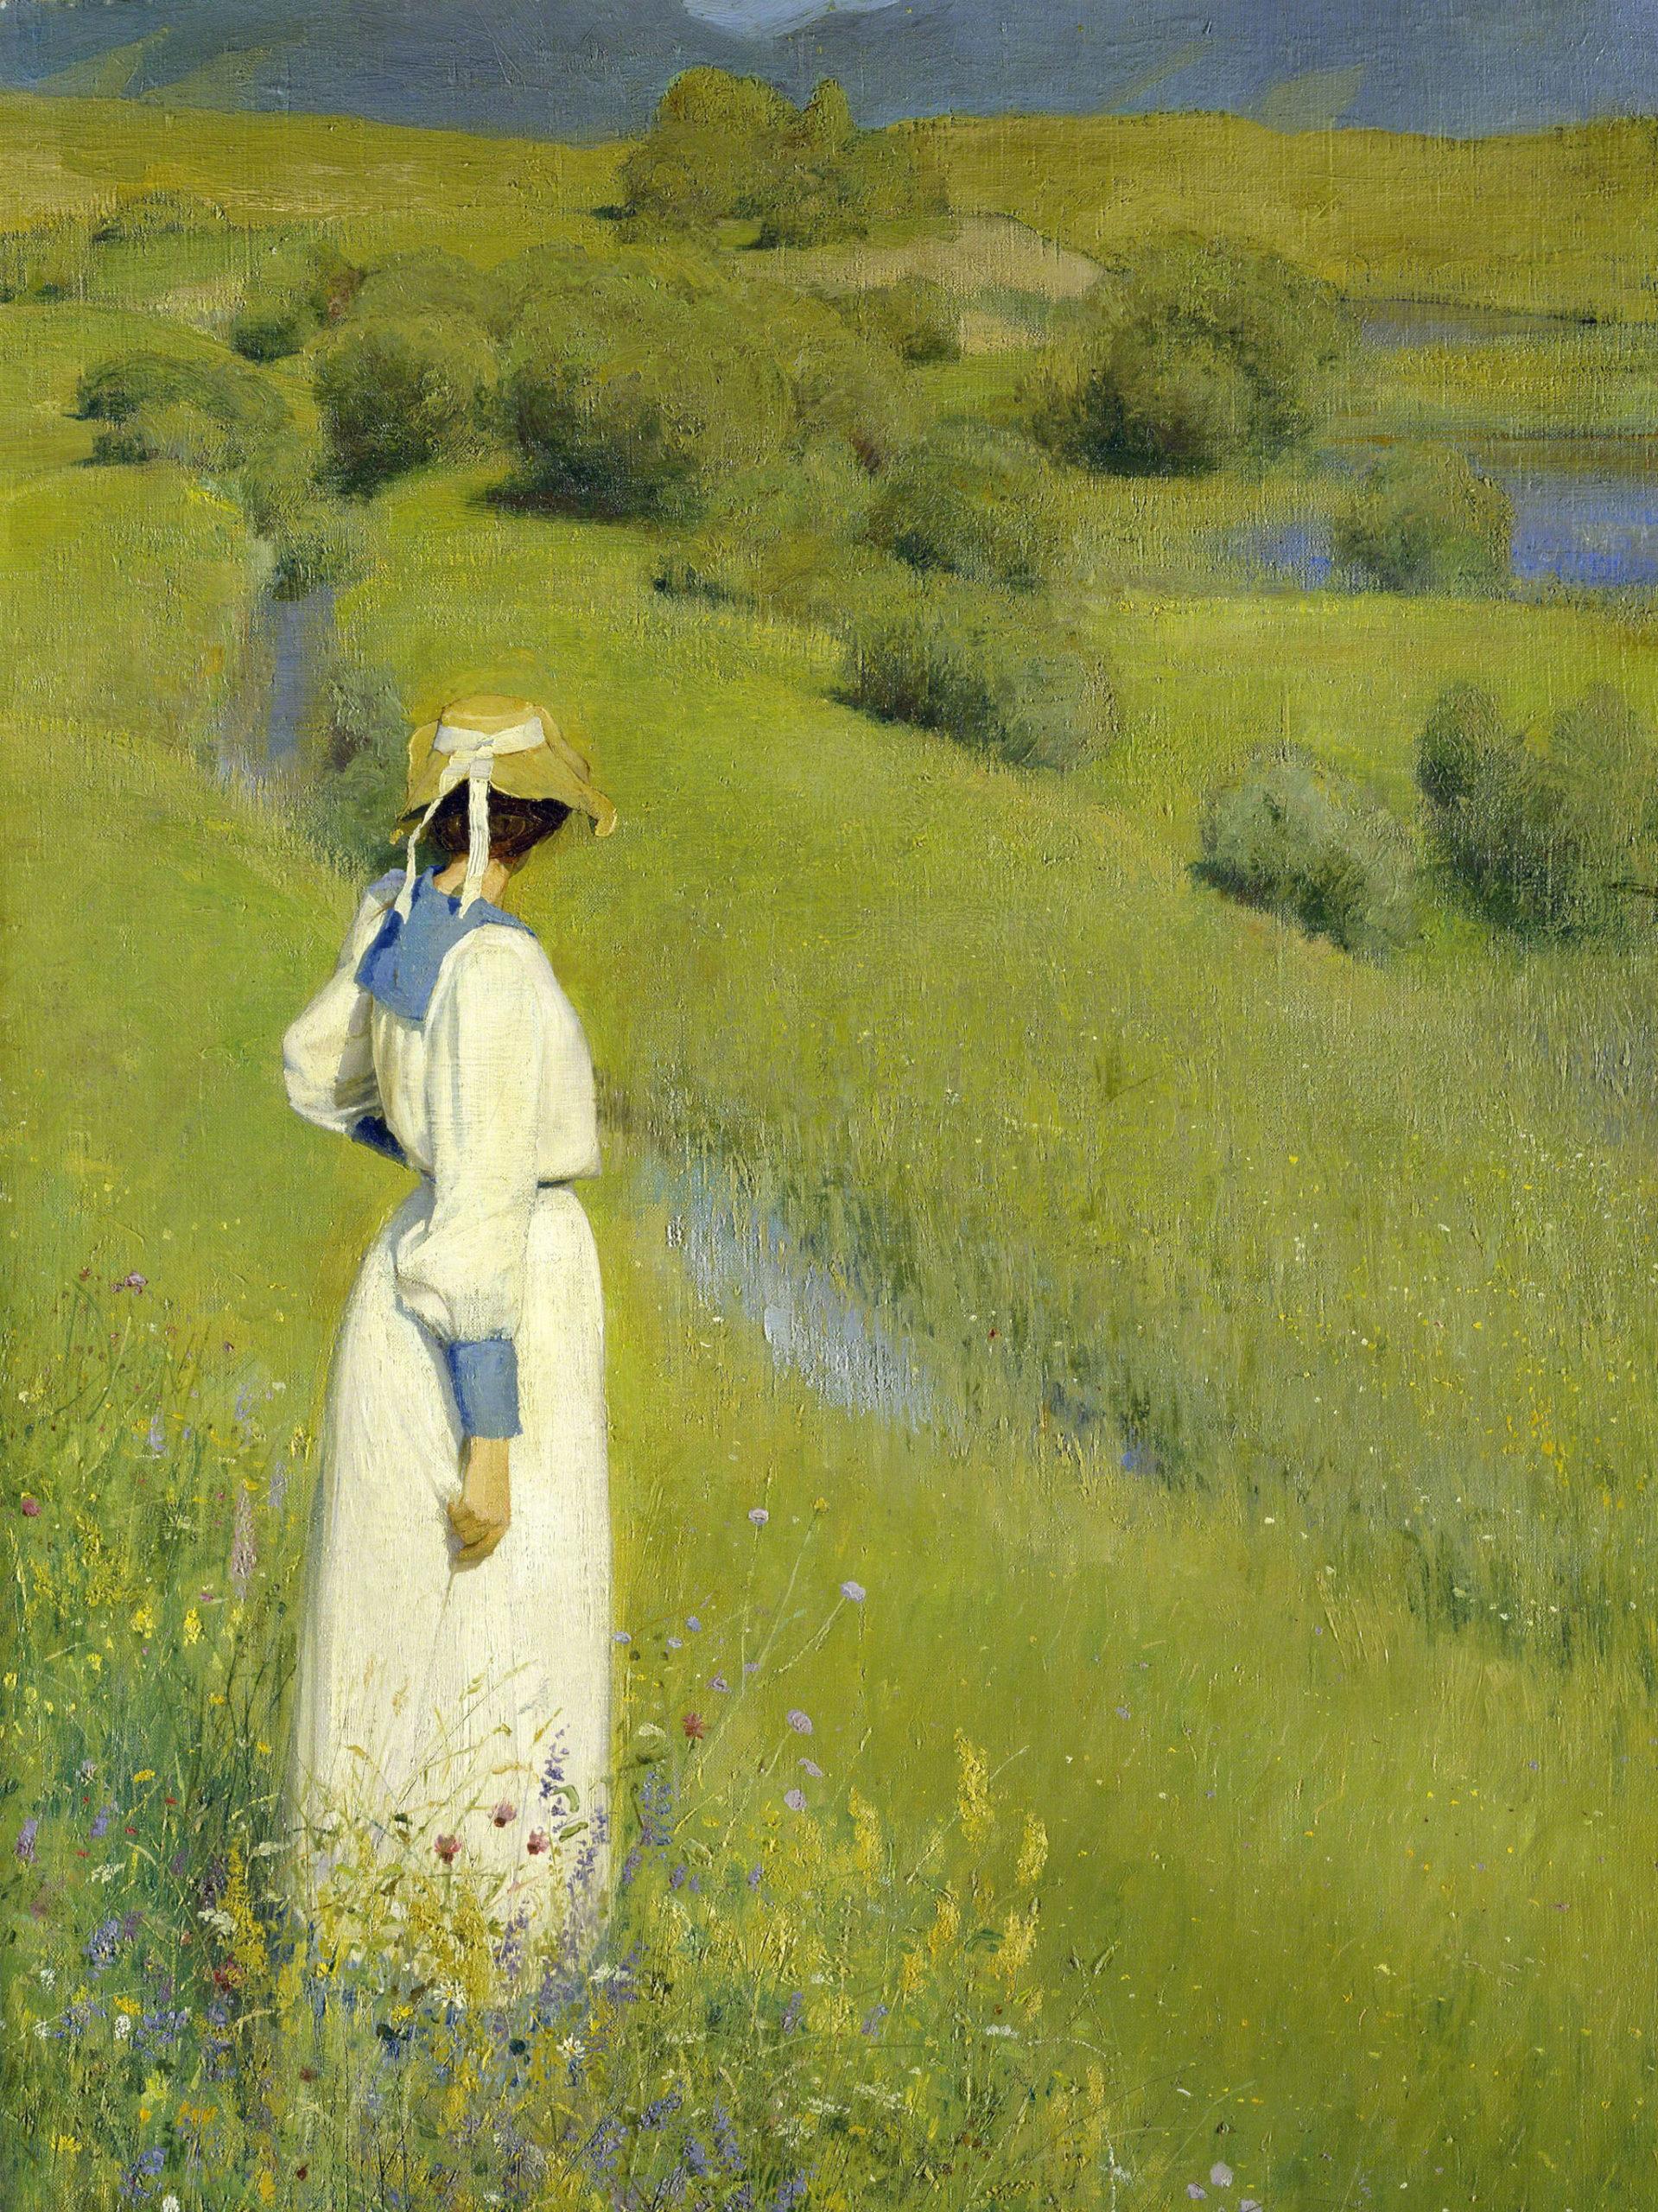 Richard Riemerschmid - In the Countryside 2048x2732